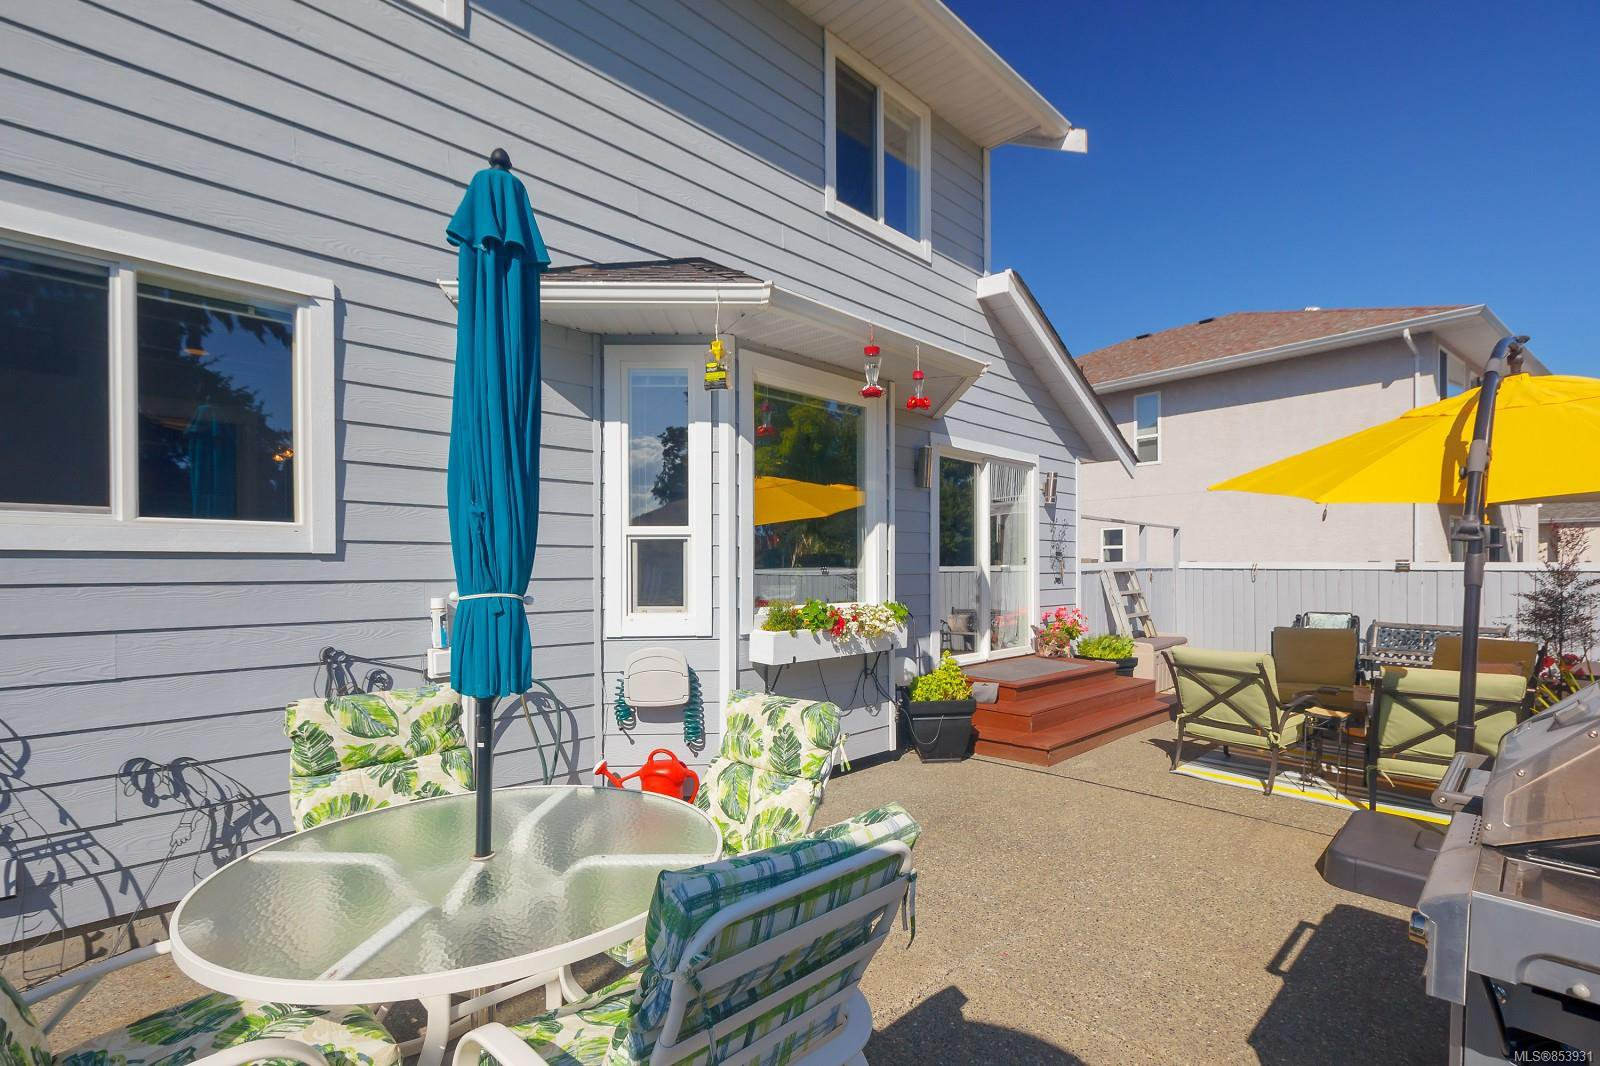 Photo 24: Photos: 2456 Timbercrest Dr in : Du East Duncan House for sale (Duncan)  : MLS®# 853931